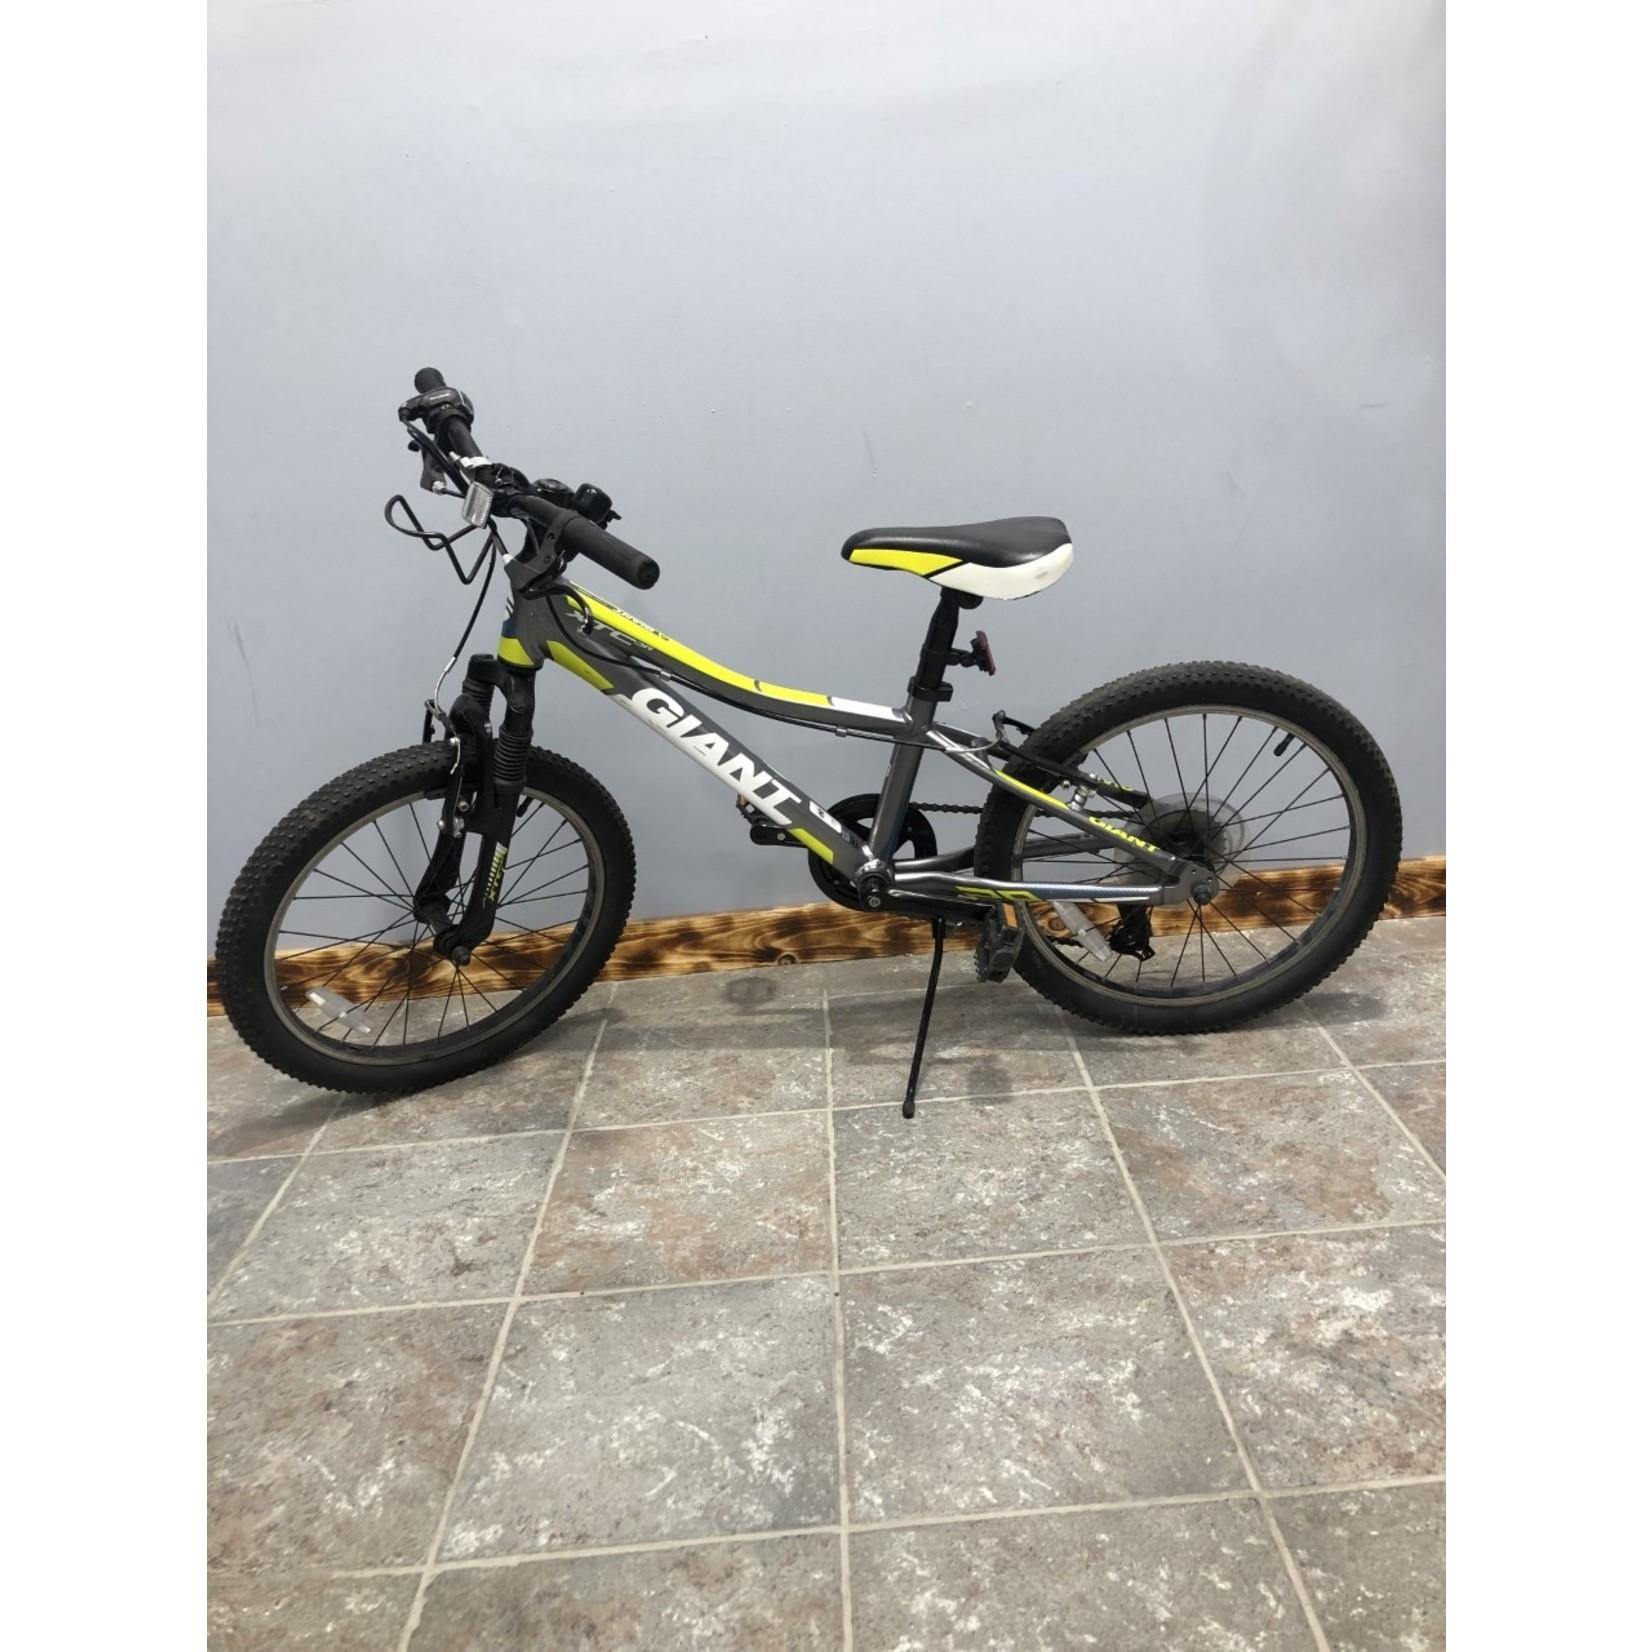 Giant XTC Jr 20 Used 300